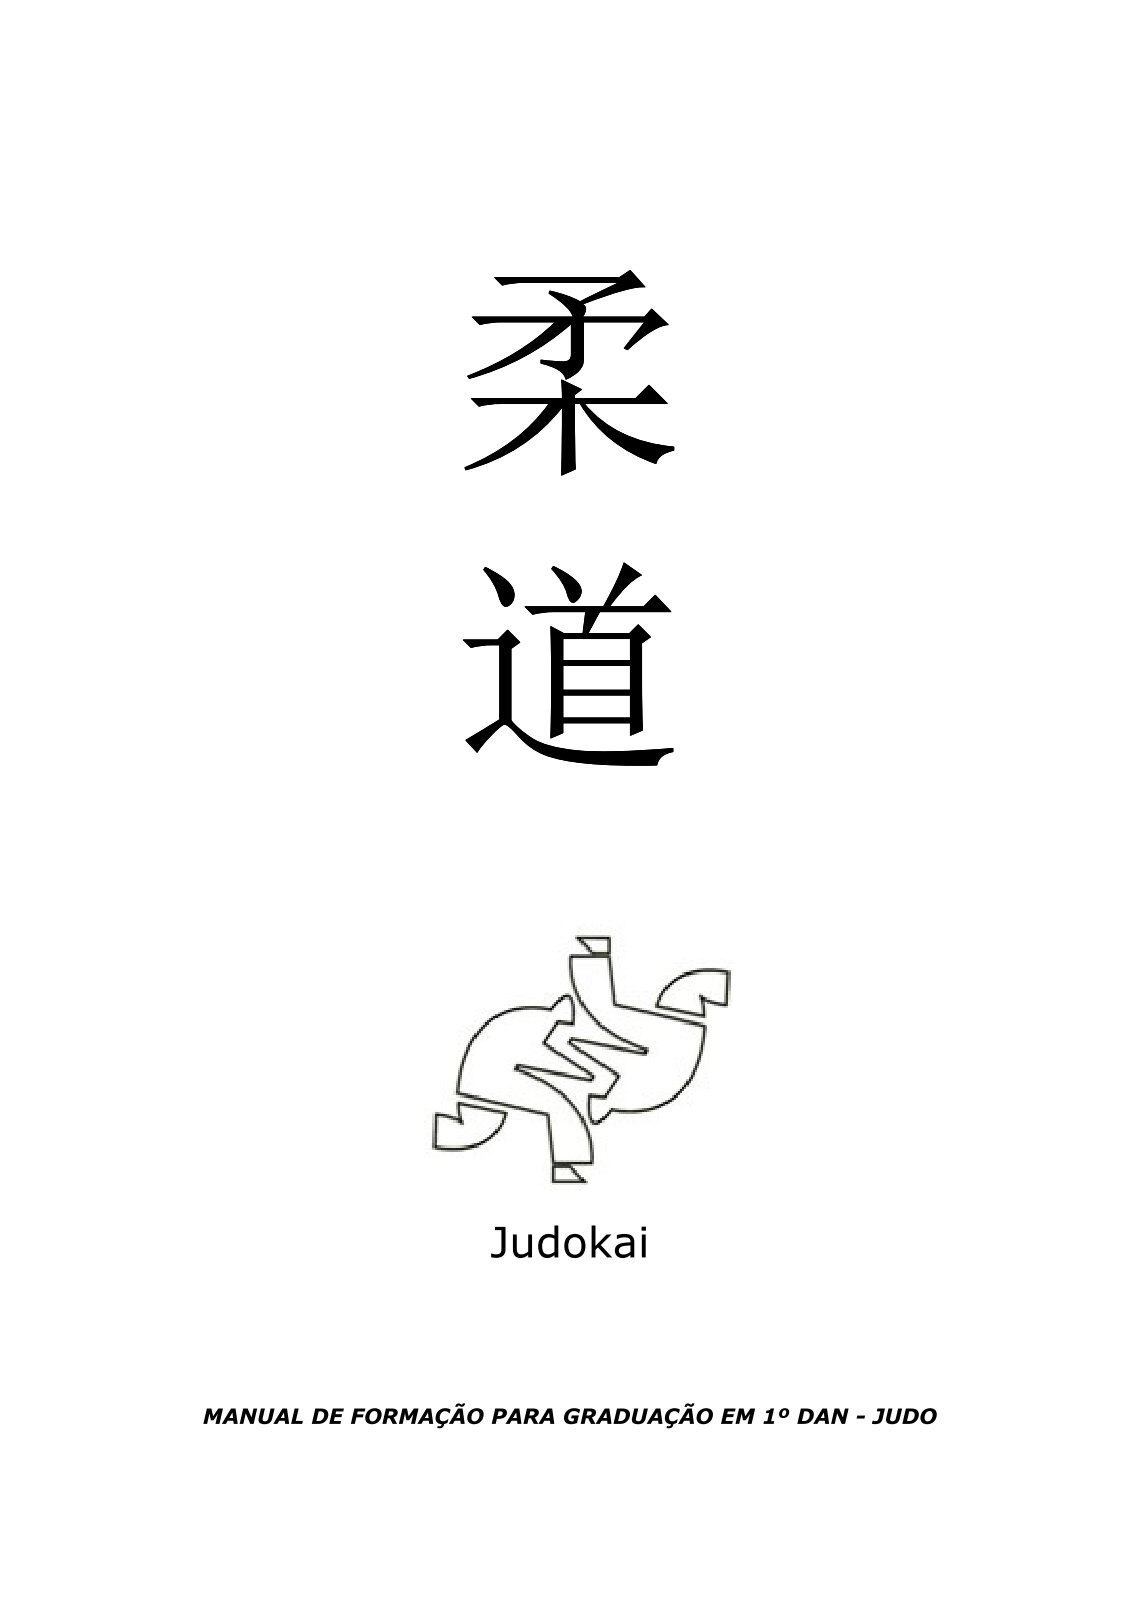 1 free Magazines from JUDOKAI.PT